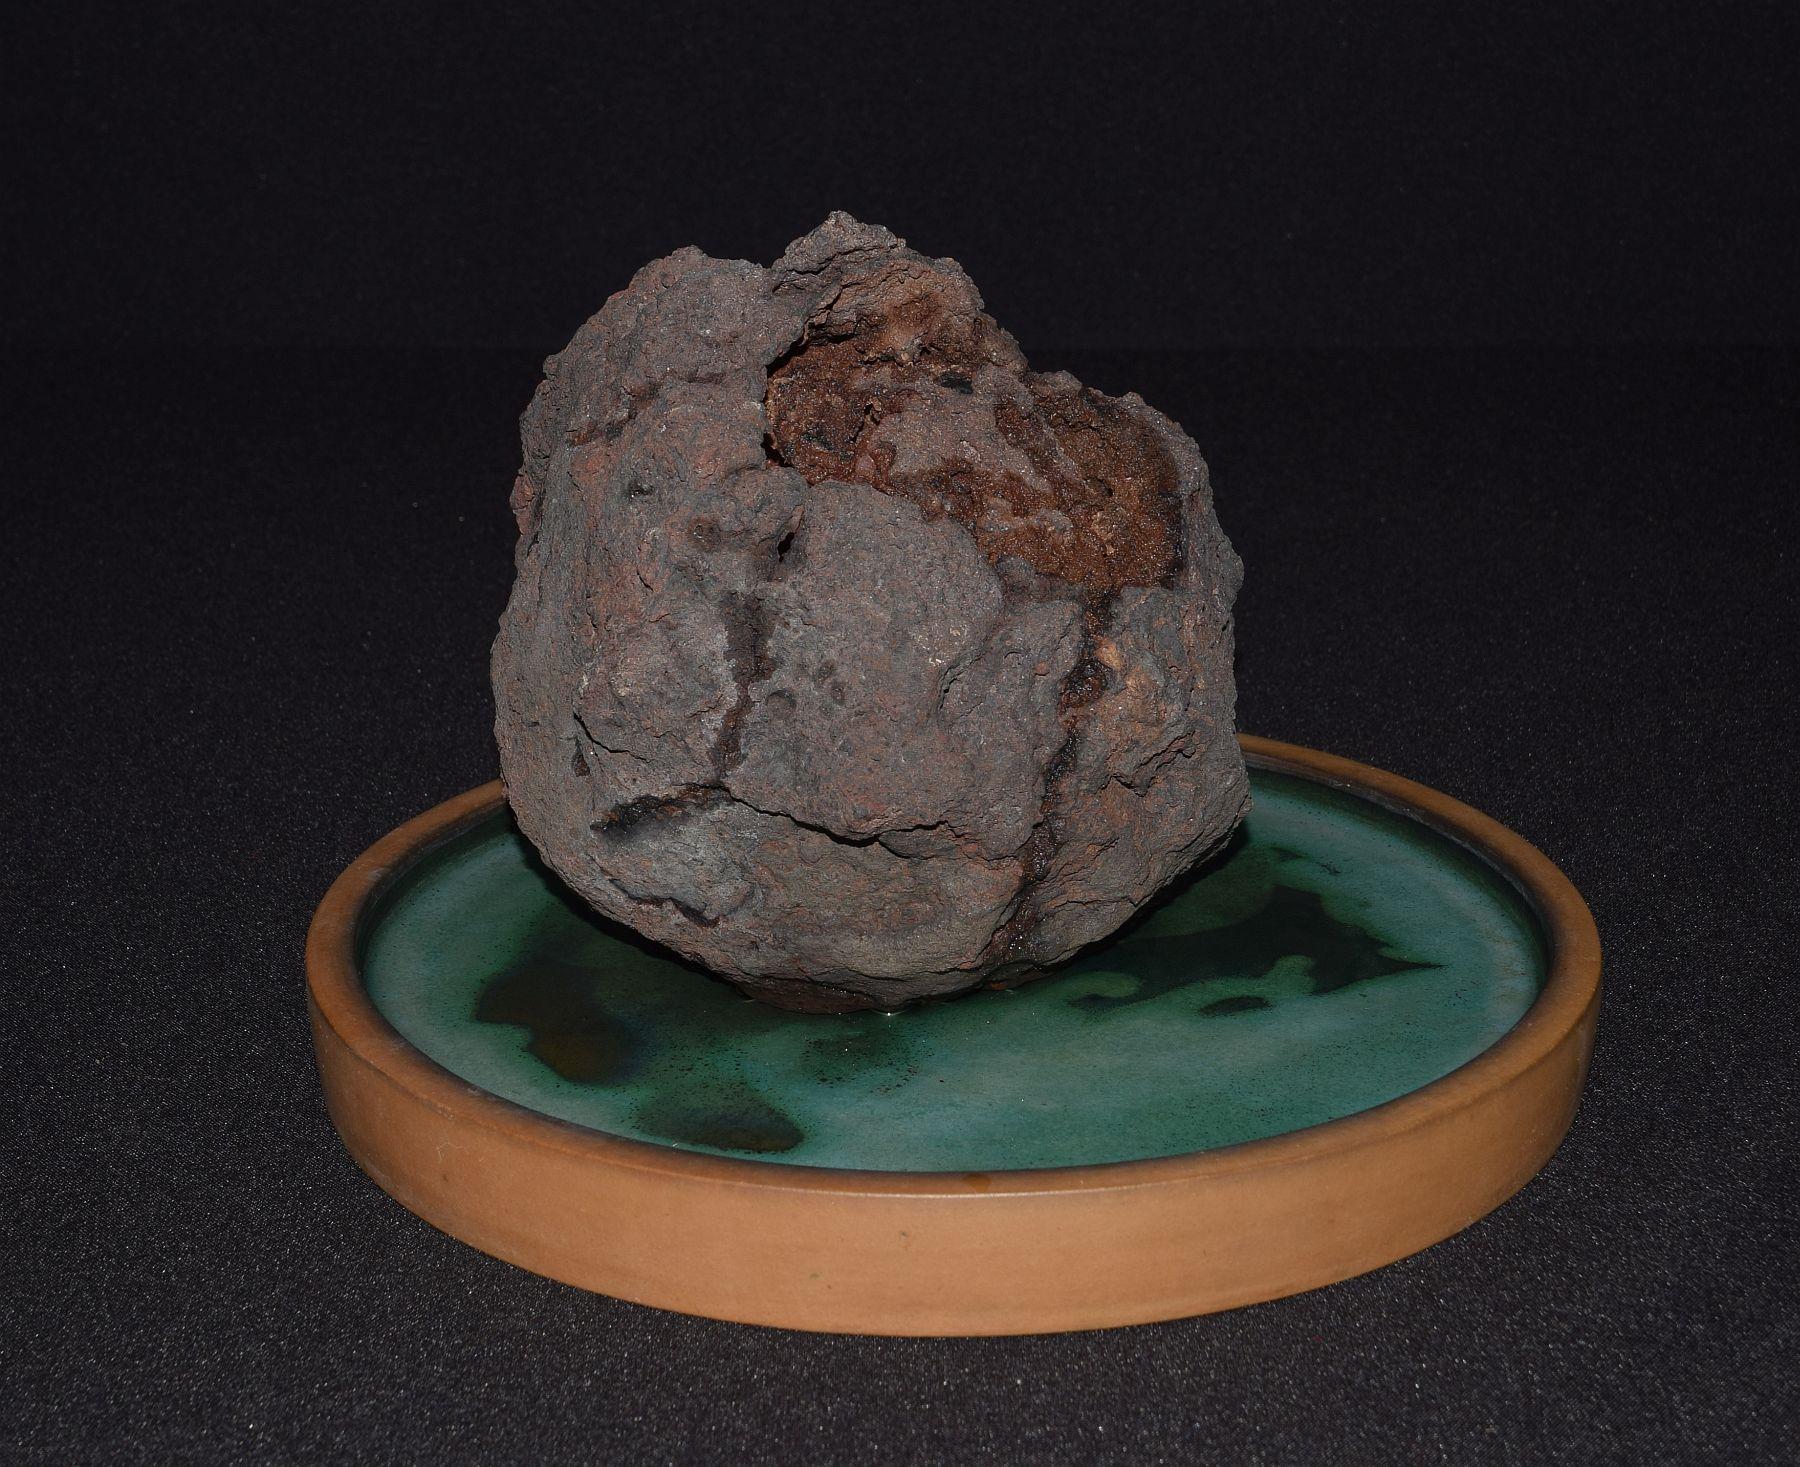 bonsai-museum-luis-vallejo-009